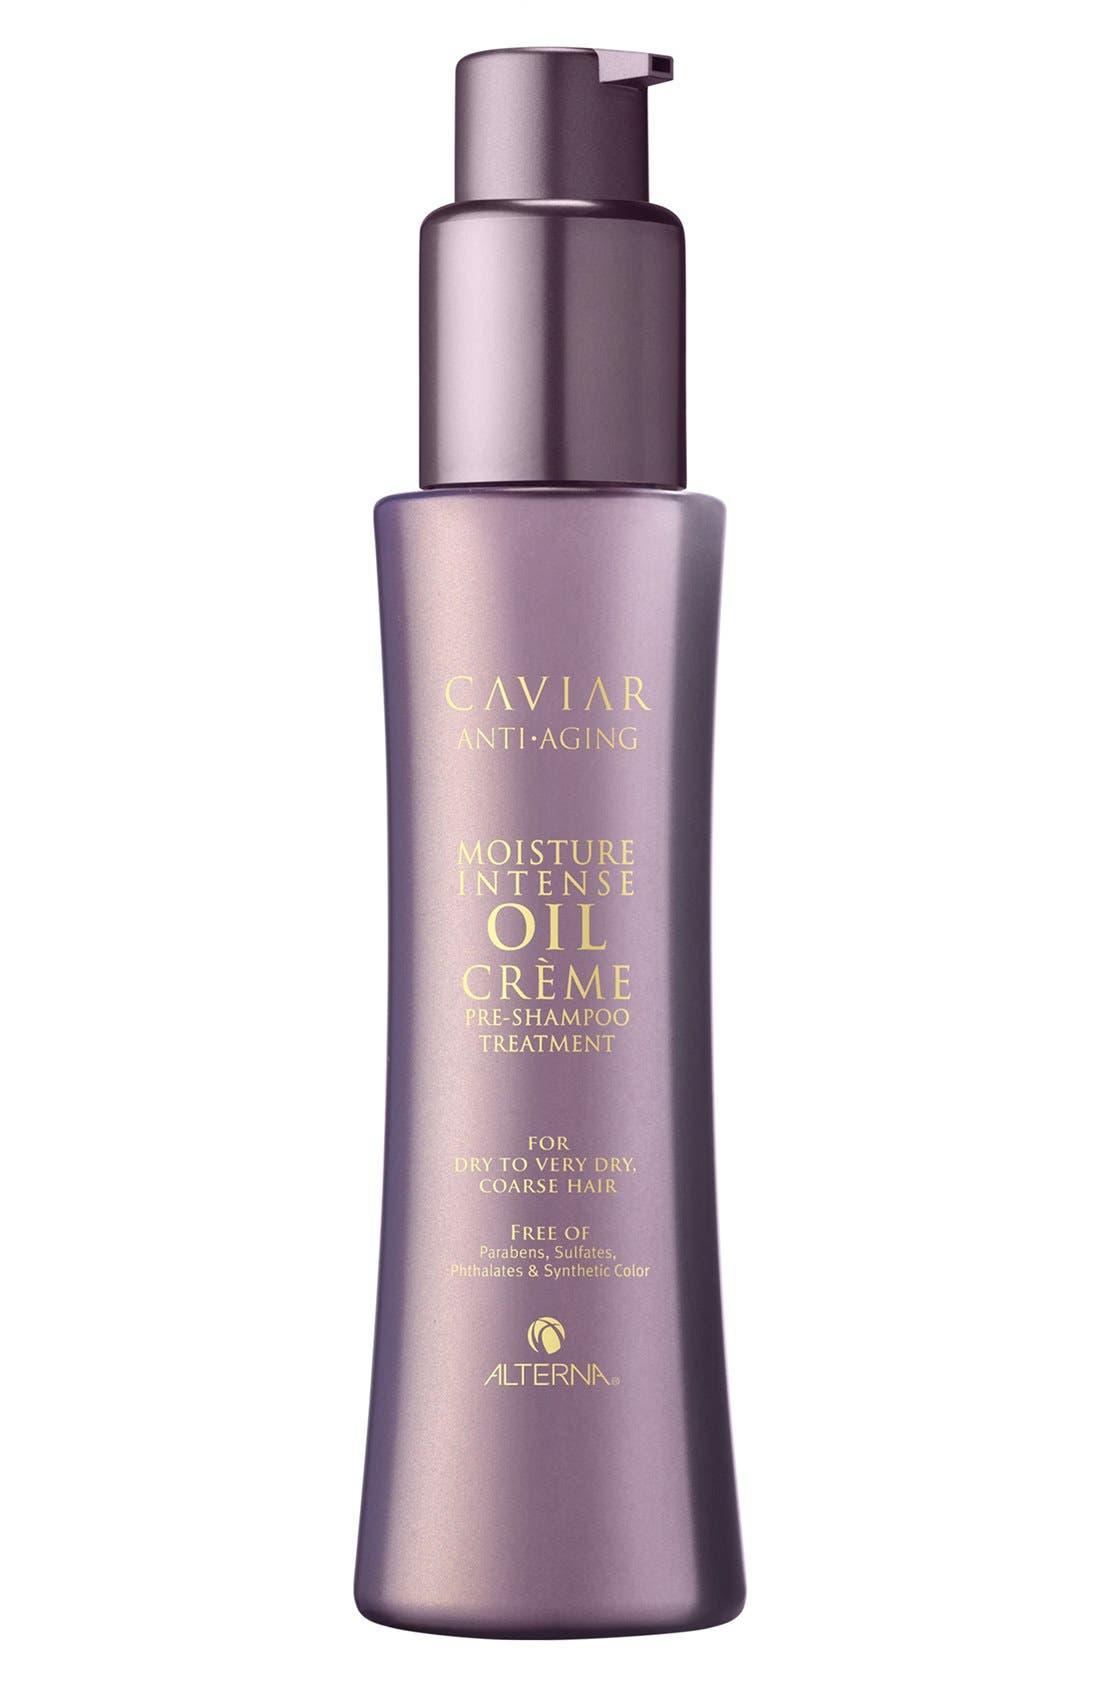 ALTERNA® Caviar Anti-Aging Moisture Intense Oil Crème Pre-Shampoo Treatment